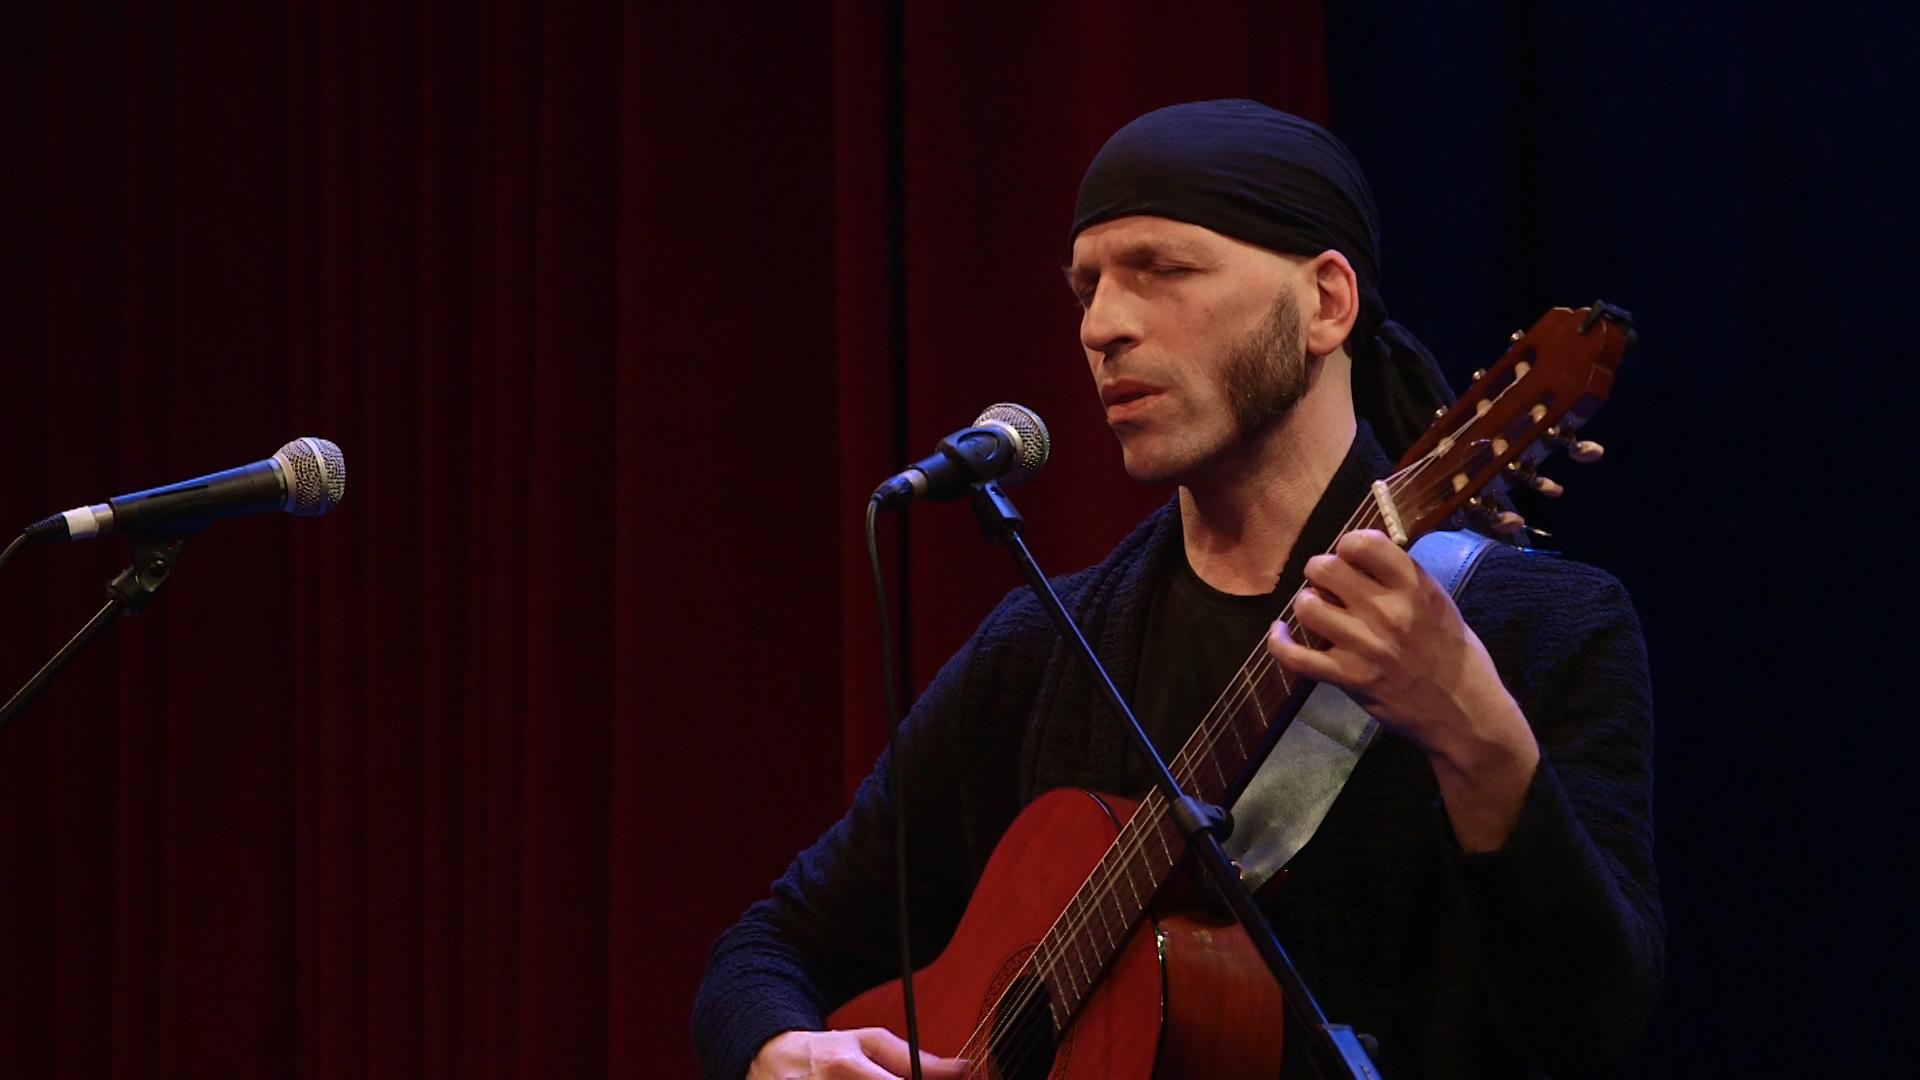 Das O.Ton Projekt live in der ufaFabrik Musik mit Obertongesang